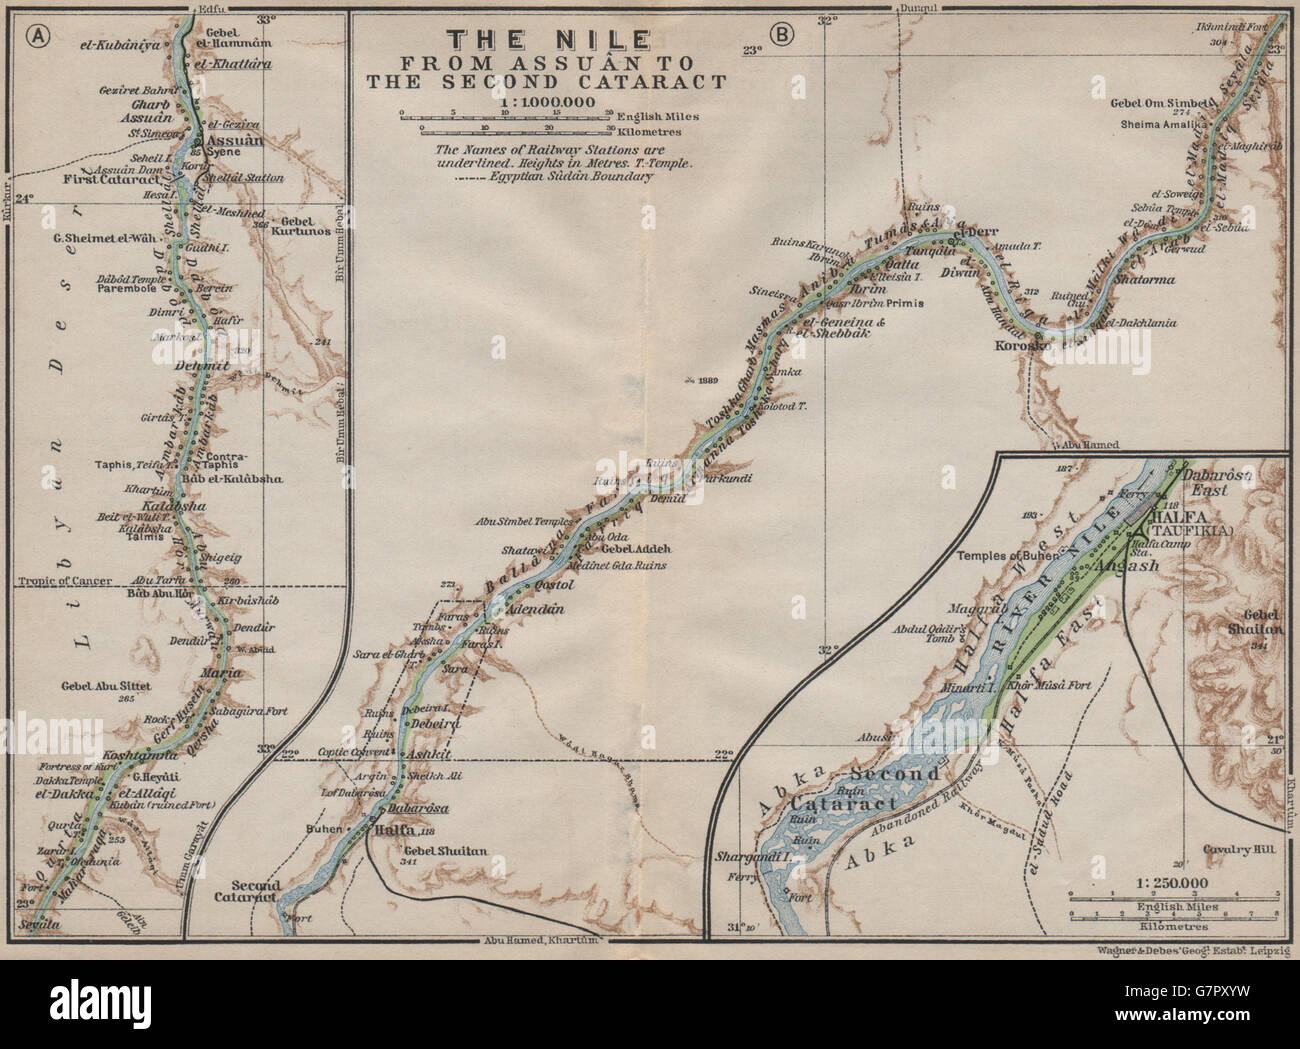 NILE RIVER VALLEY Aswan-Wadi Halfa/2nd cataract Pre-Lake